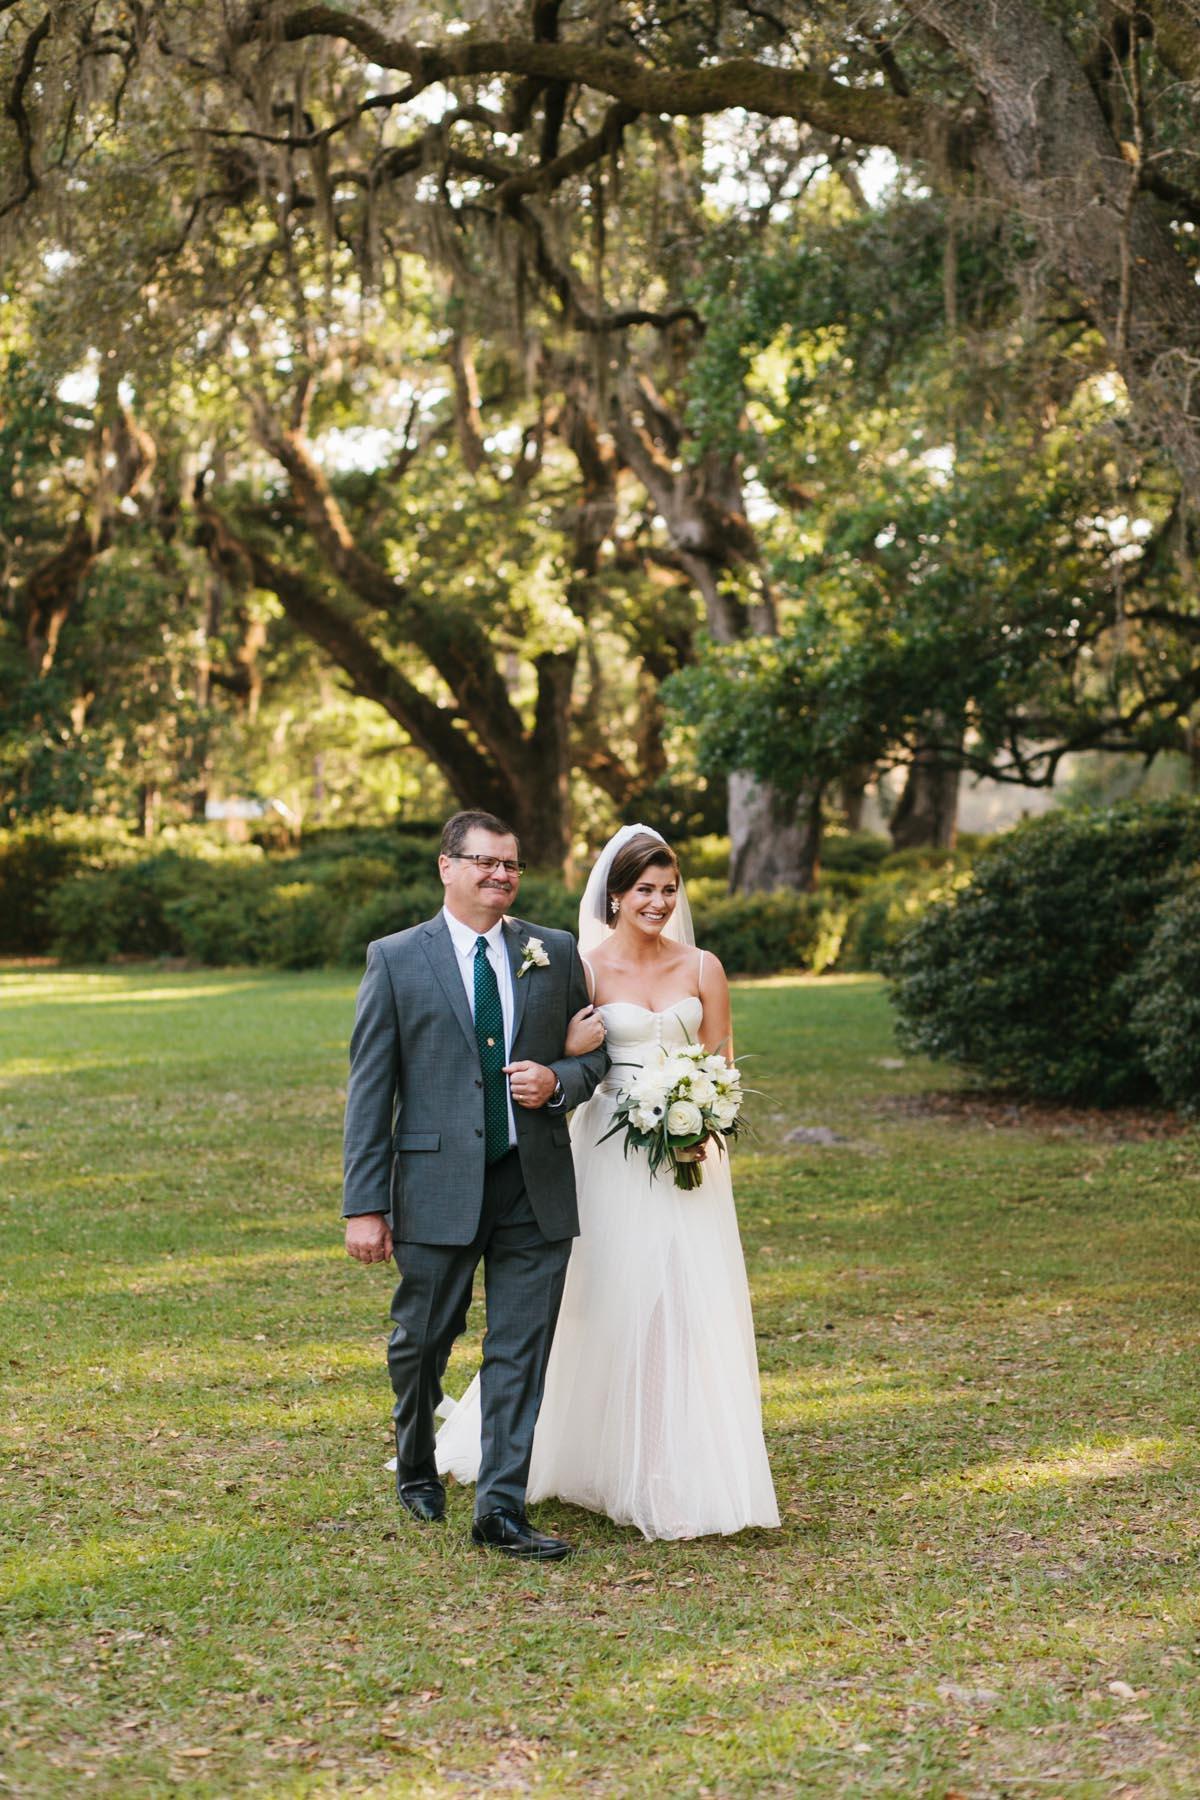 lowry wedding blog eden garden florida wedding-58